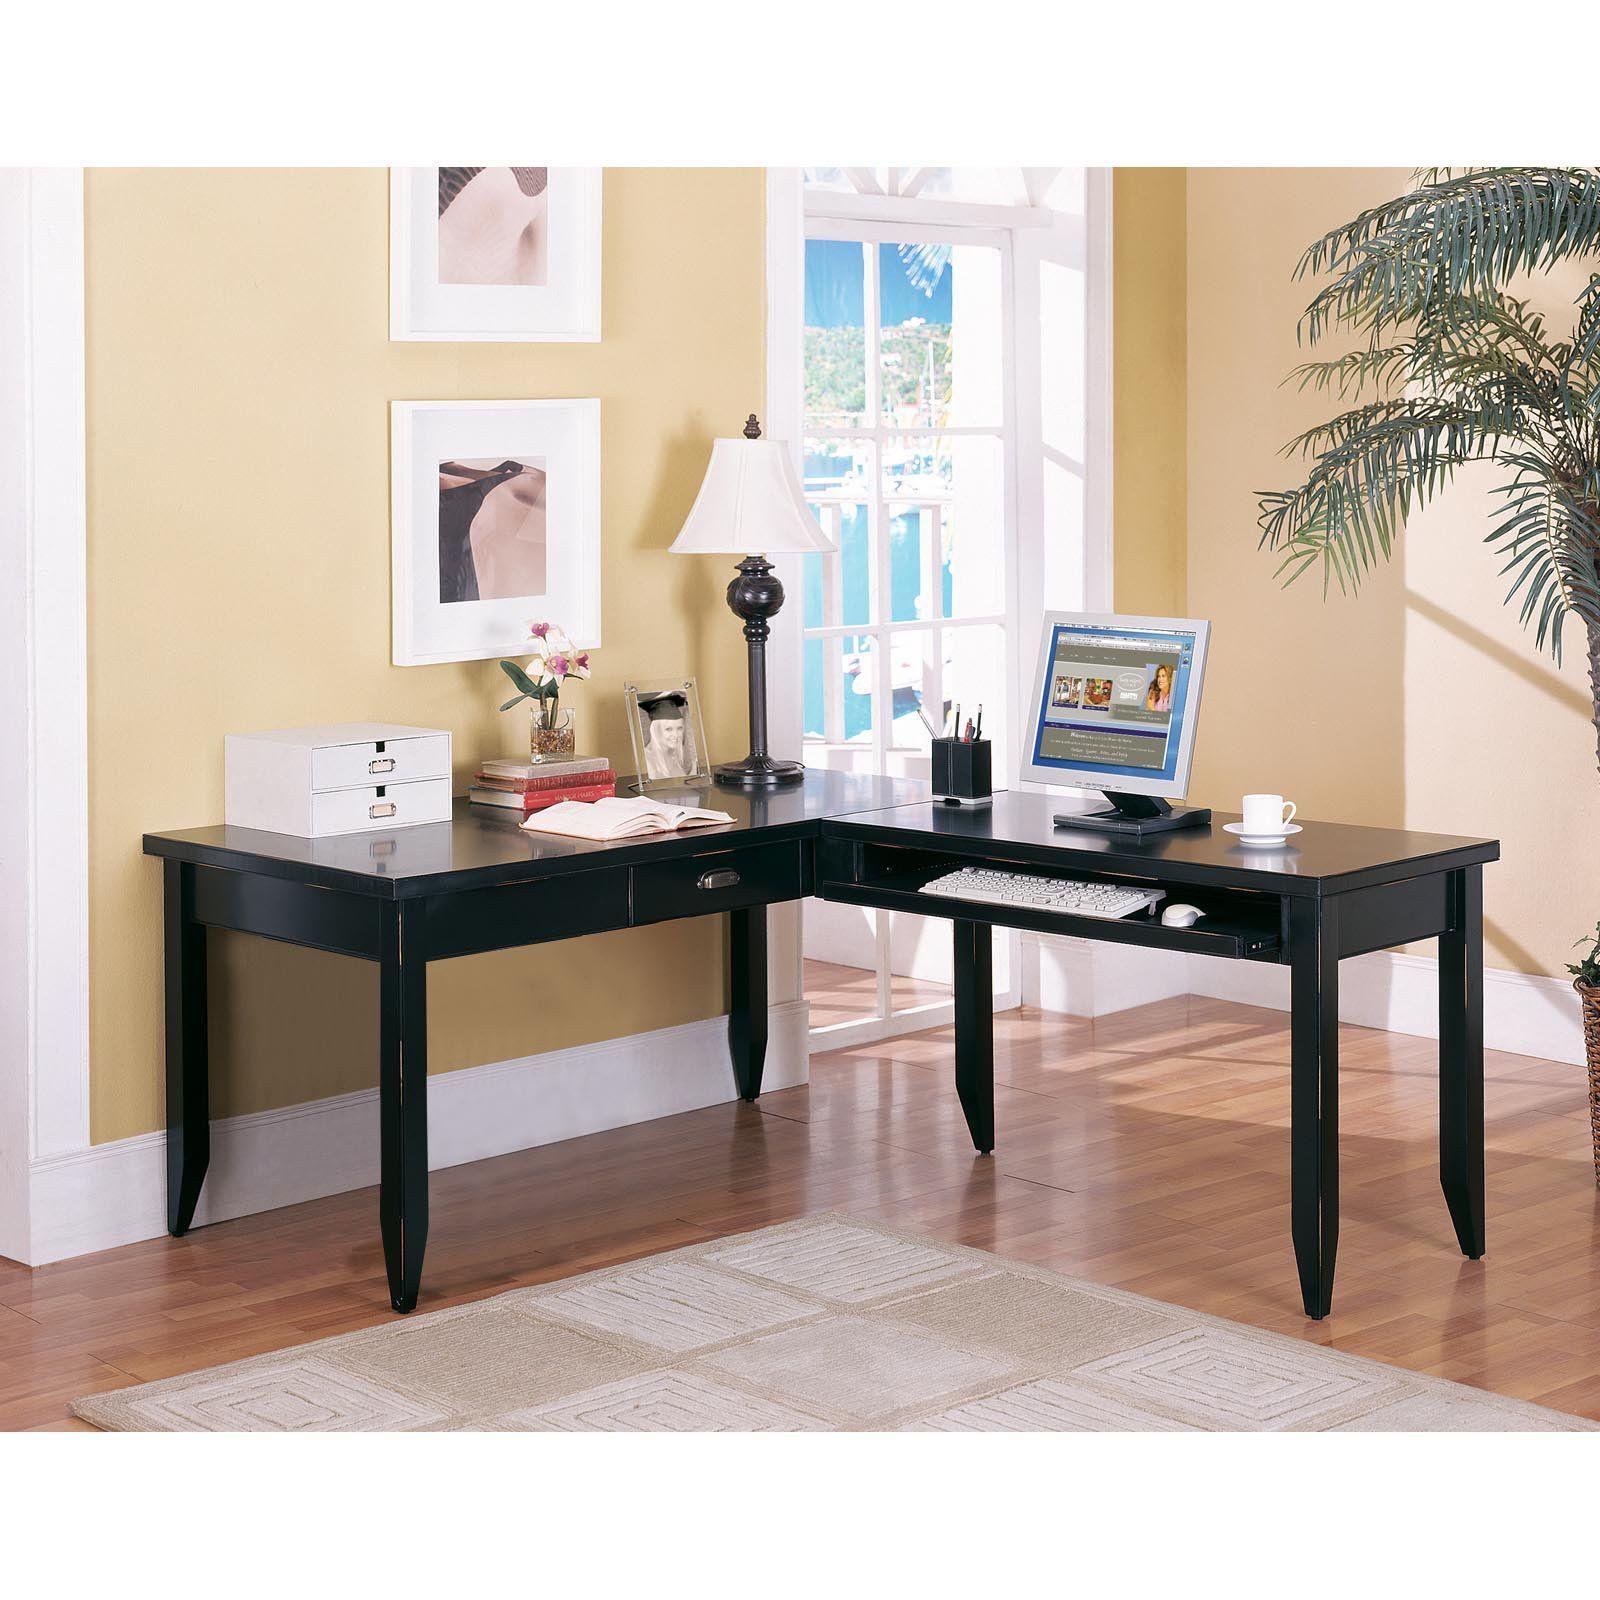 Kathy Ireland Corner Desk Luxury Living Room Furniture